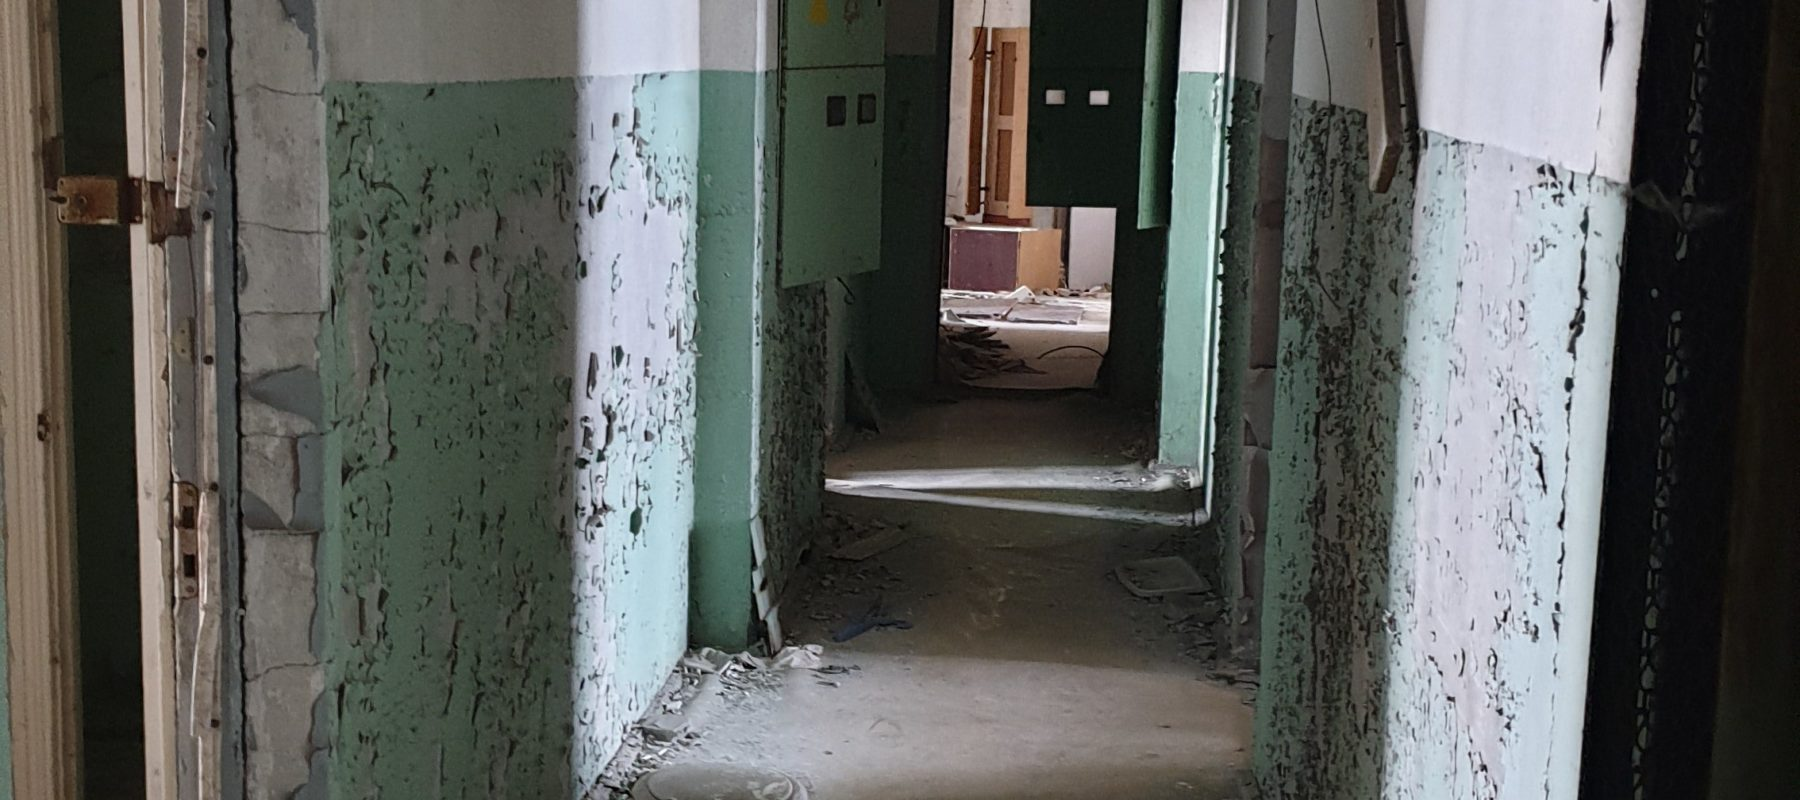 Pripyat. Skyscraper. Corridor